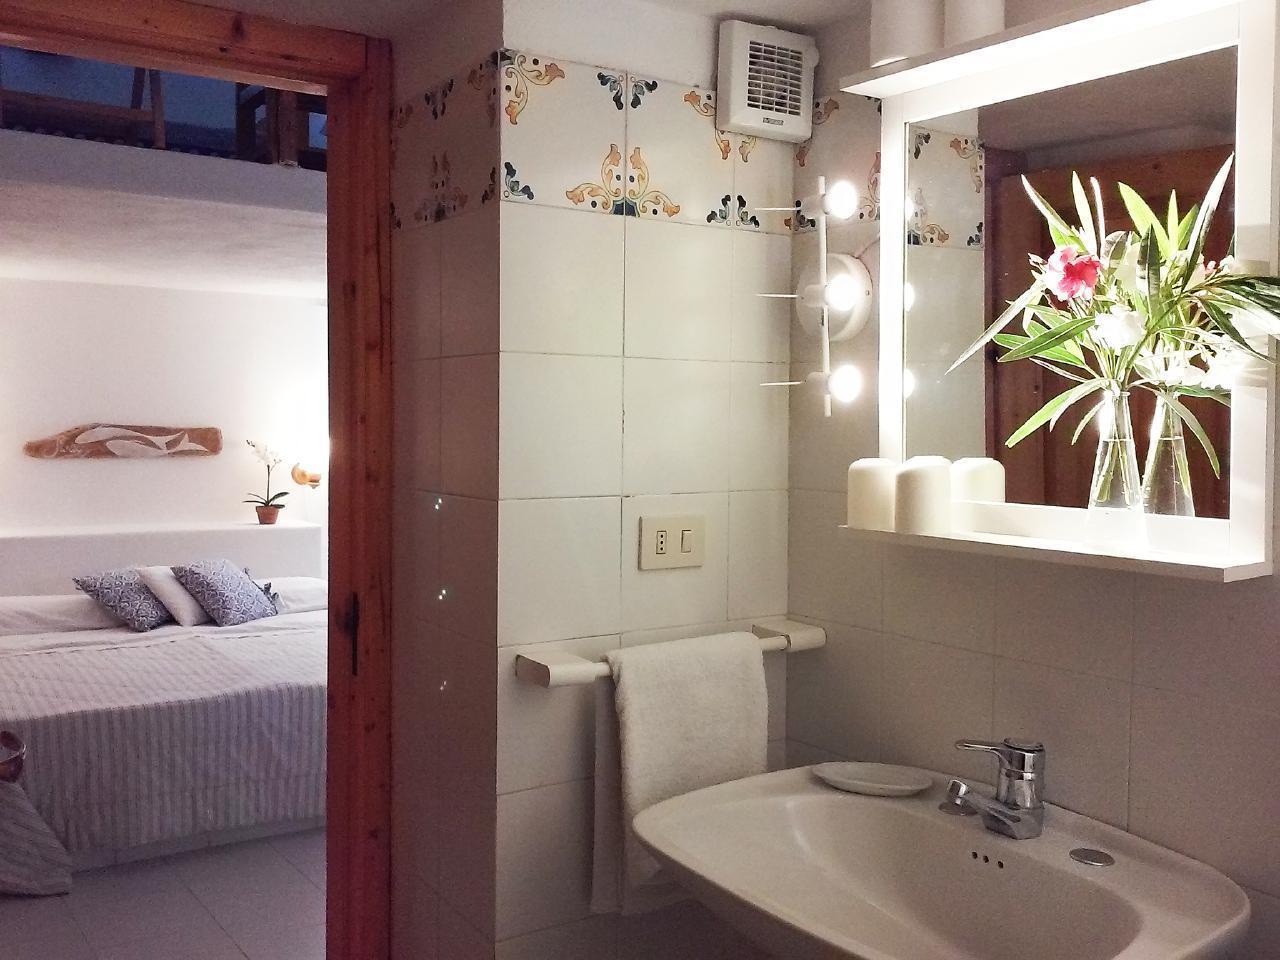 Maison de vacances Ferienhaushälfte Solandra auf sizilianischer Insel mit atemberaubenden Meeres-Rundblick (2038046), Lipari, Lipari, Sicile, Italie, image 25